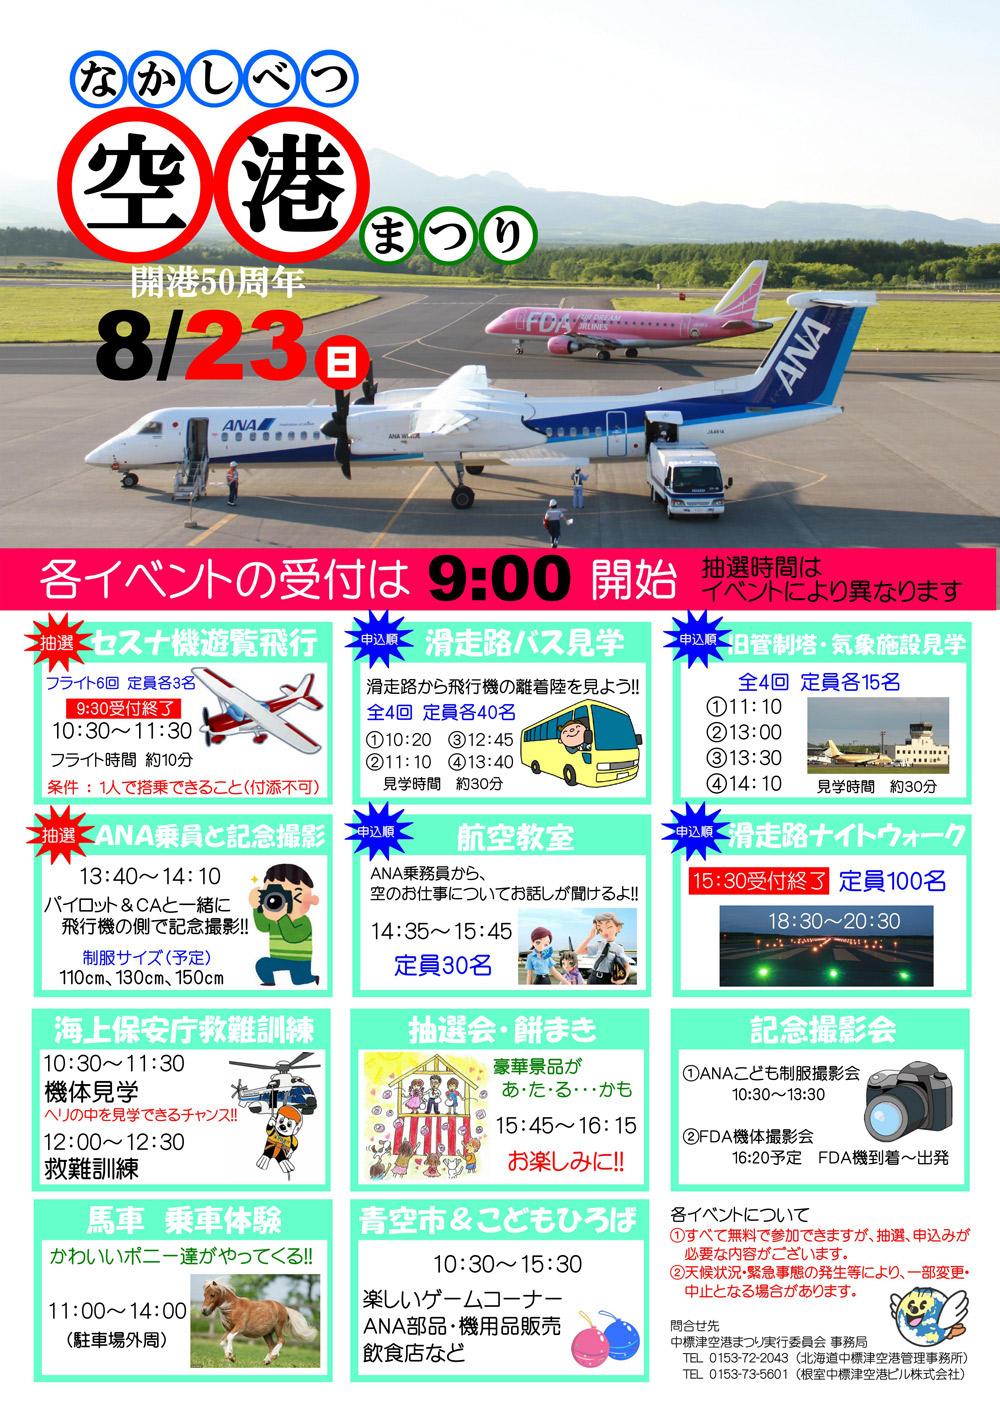 http://www.nakashibetsu-airport.jp/2015%20matsuri.jpg